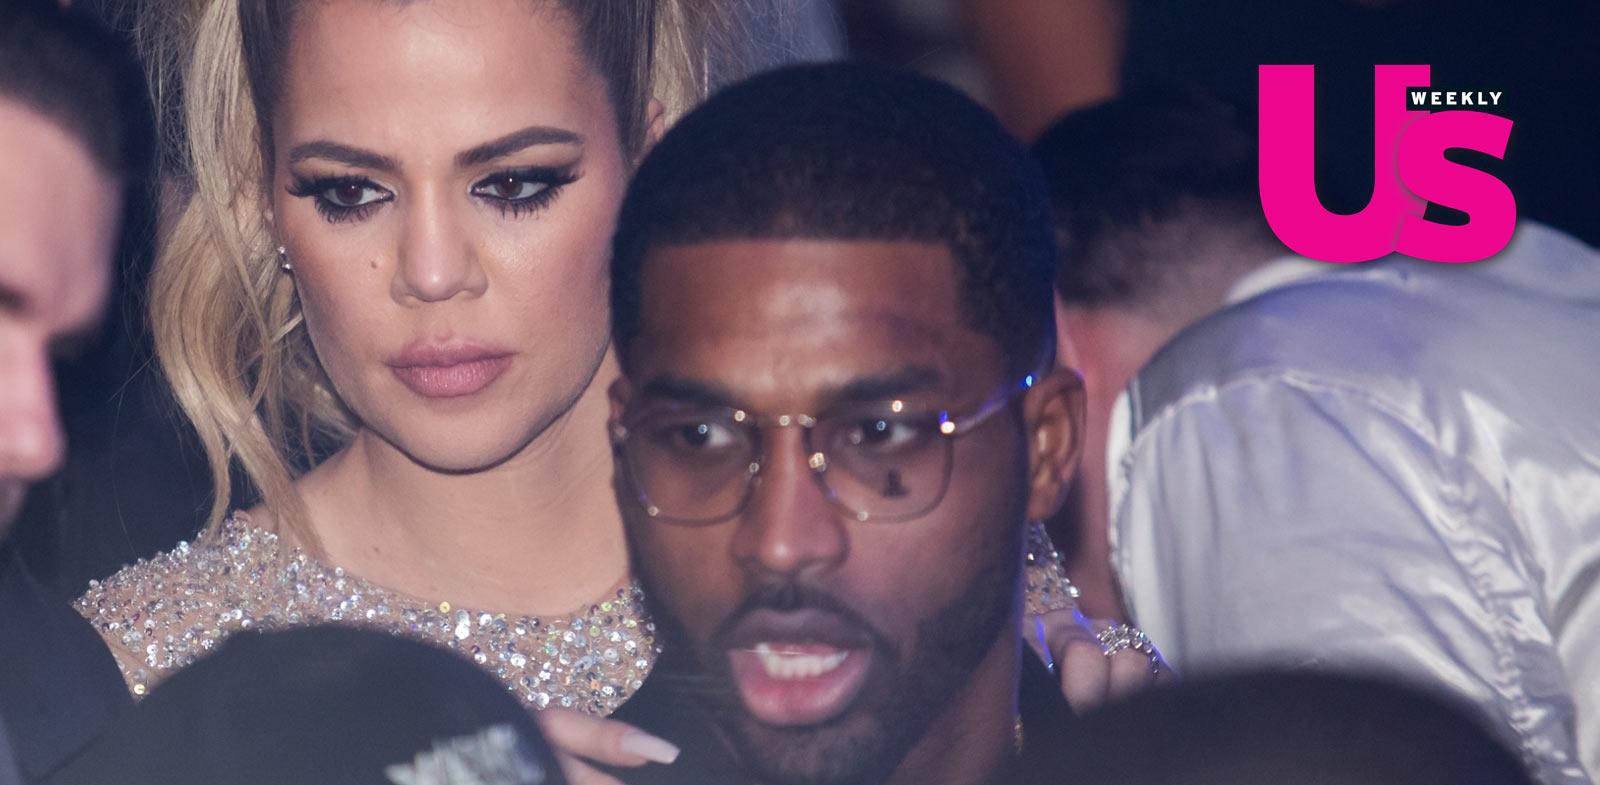 Khloe Kardashian Kisses Boyfriend Tristan Thompson on New Year's Eve